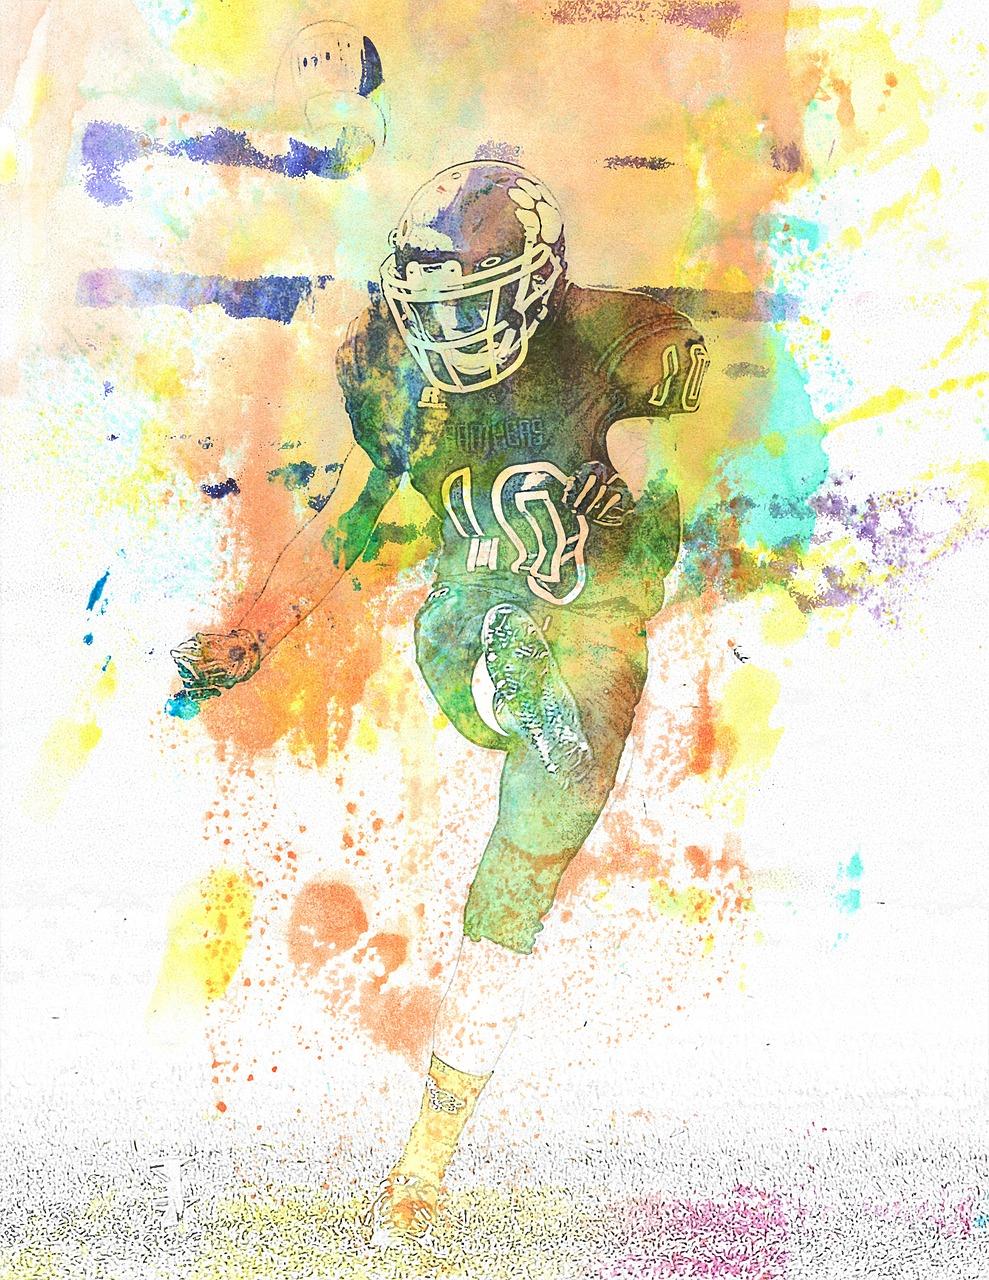 Abstract Art Football